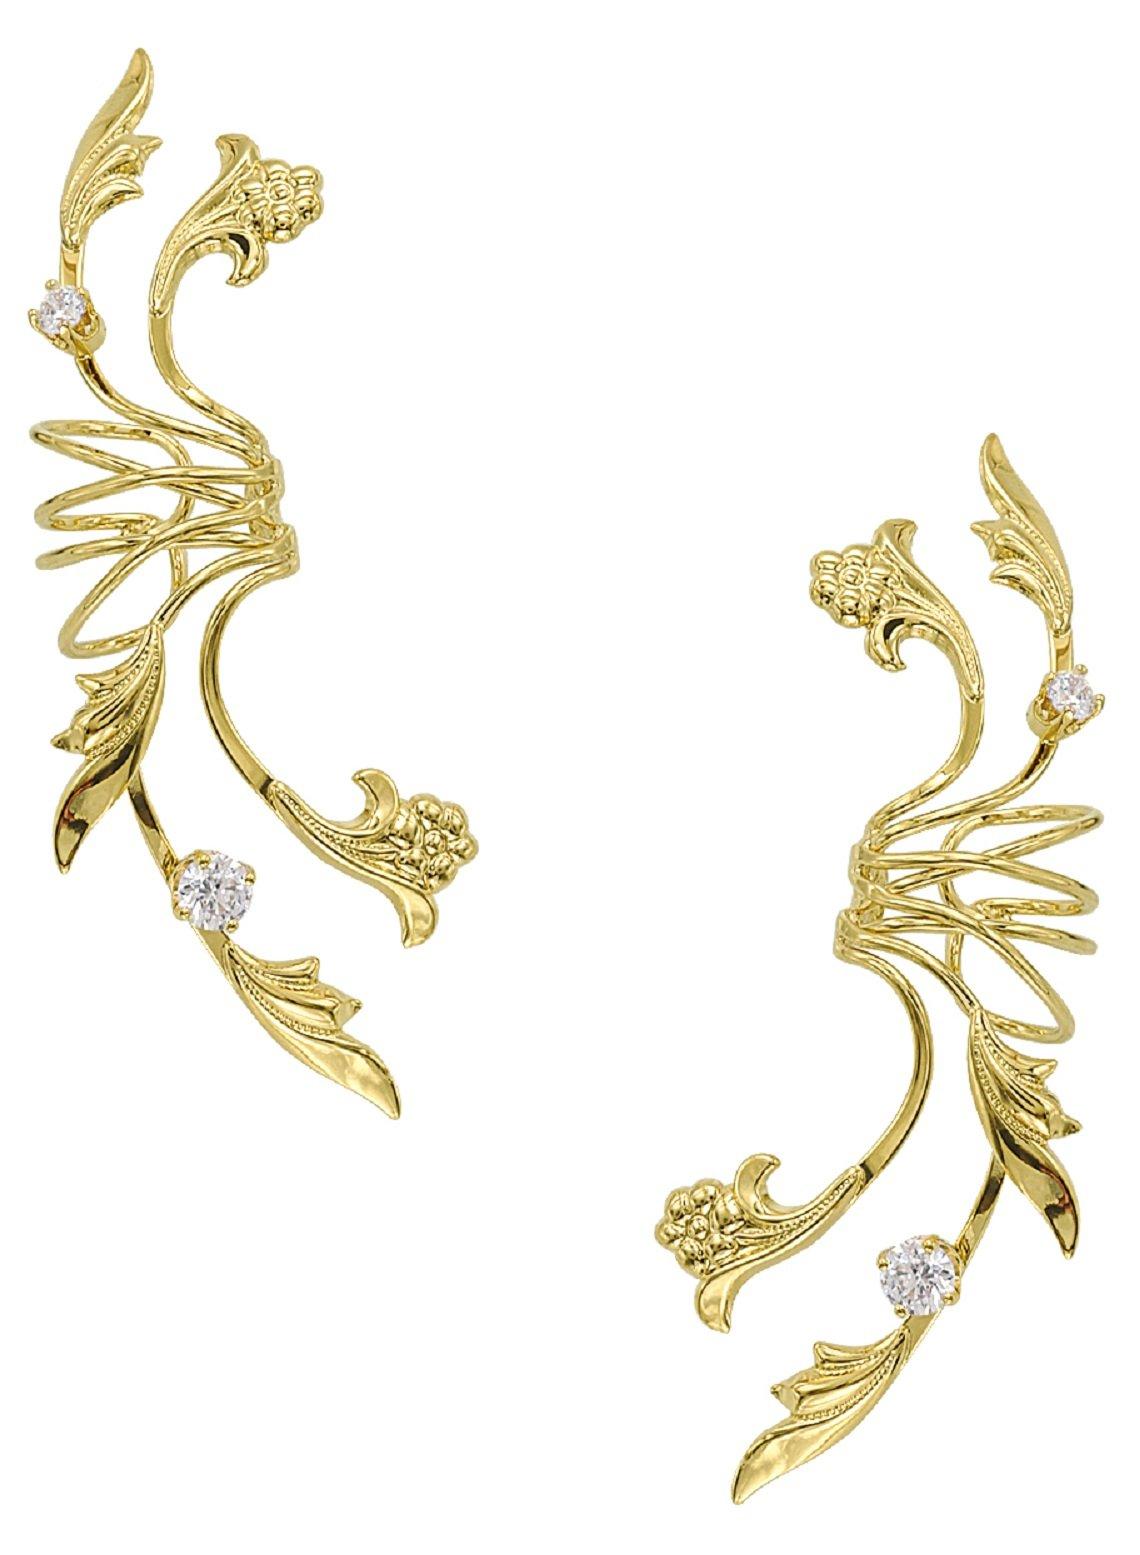 Ear Charm's Non-Pierced Floral CZ Full Ear Spray Ear Cuff Gold on Sterling Silver PAIR of Earring Cuffs